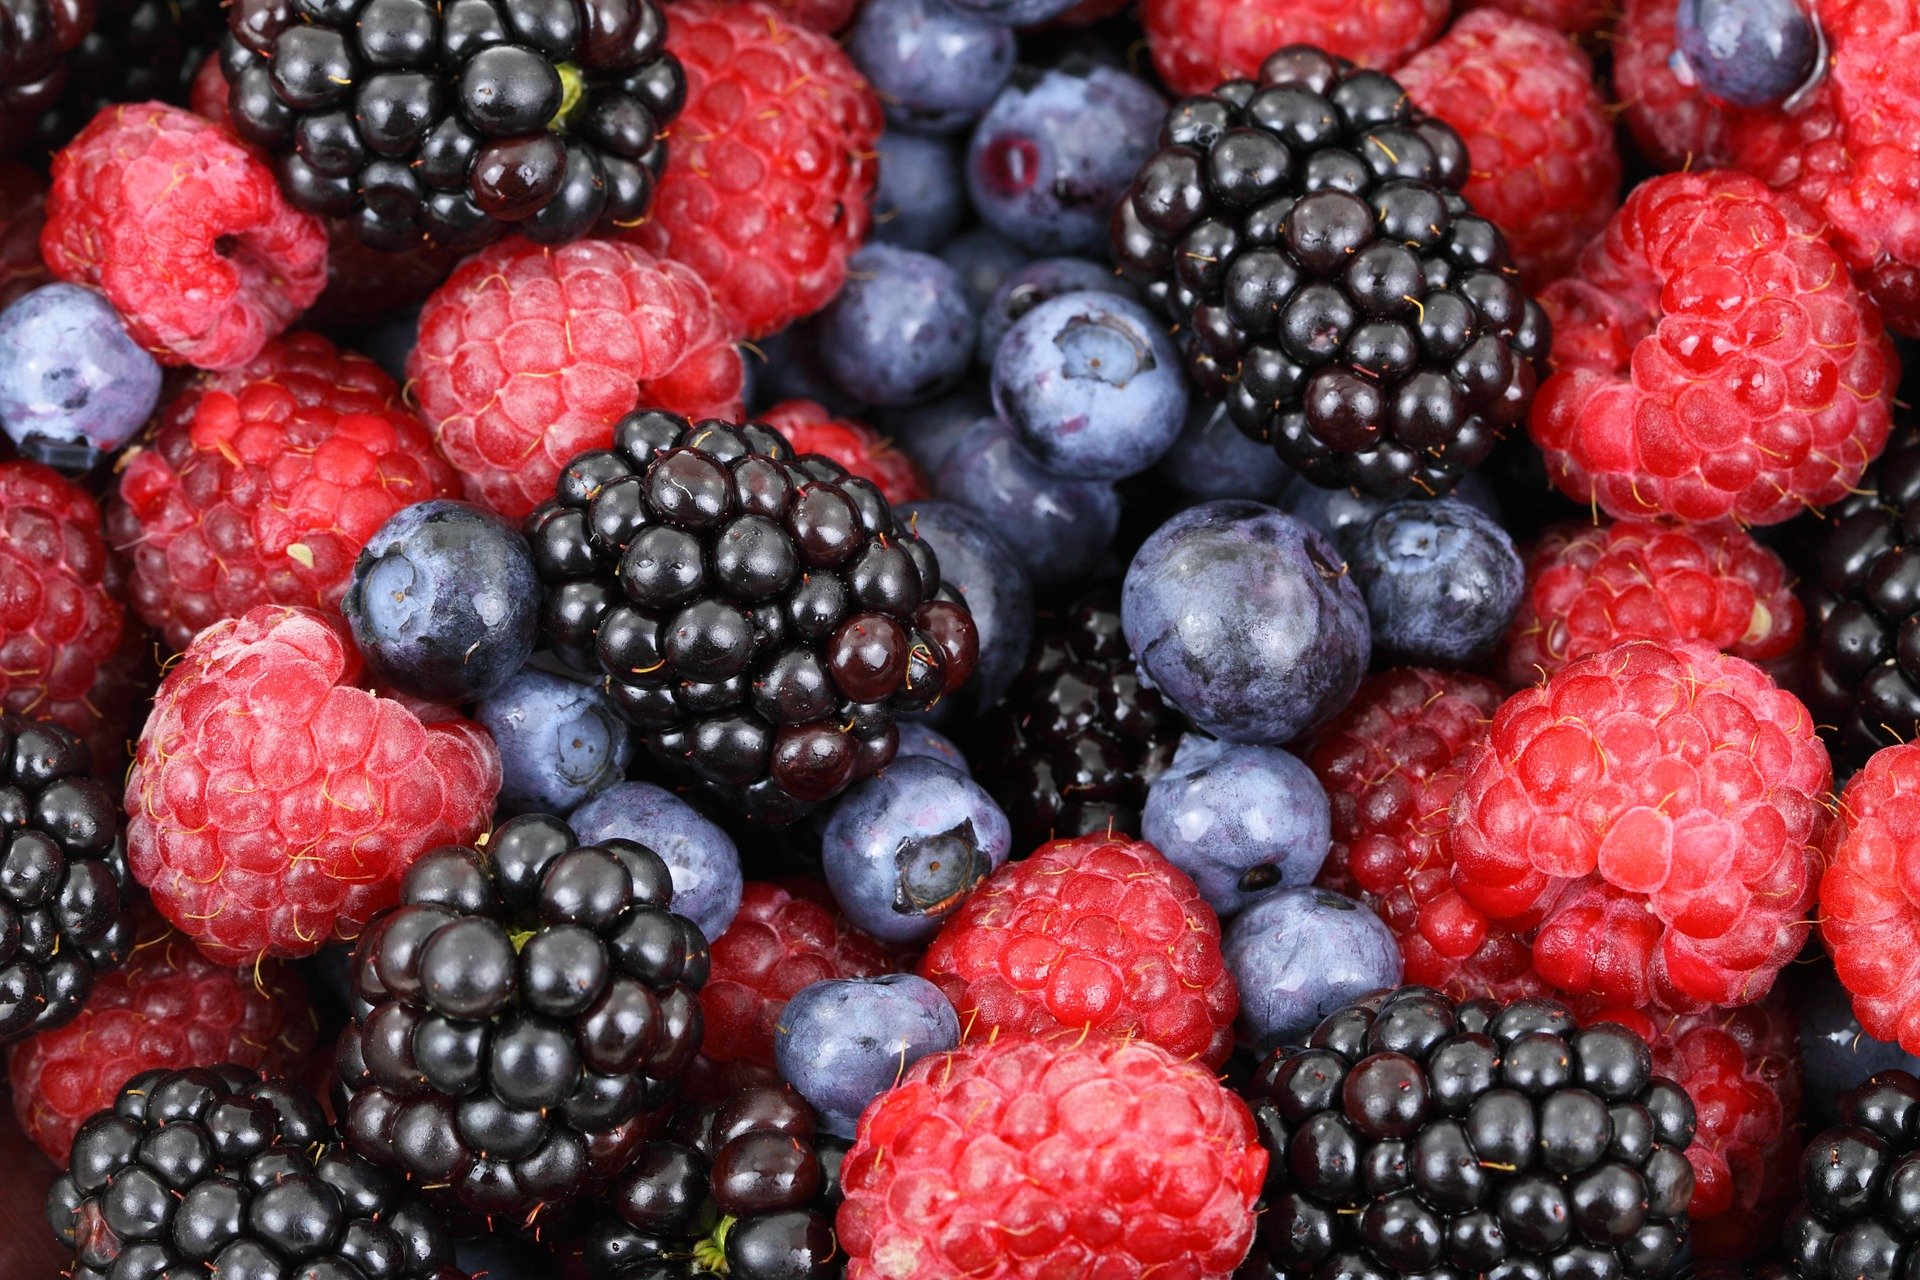 Autismul, dieta cu fructe